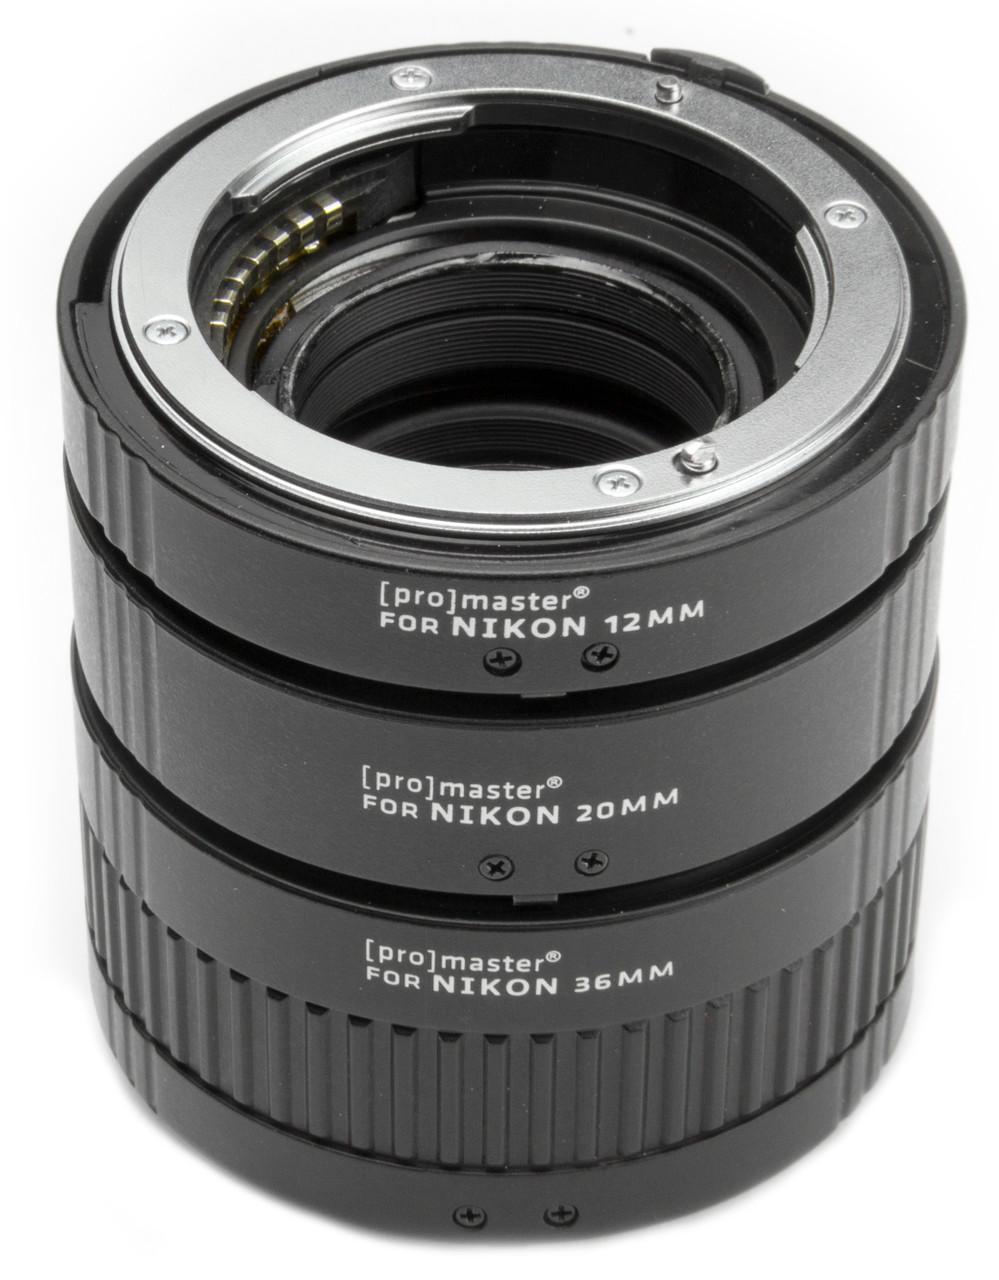 ProMaster Automatic Extension Tube Set - for Nikon #5440